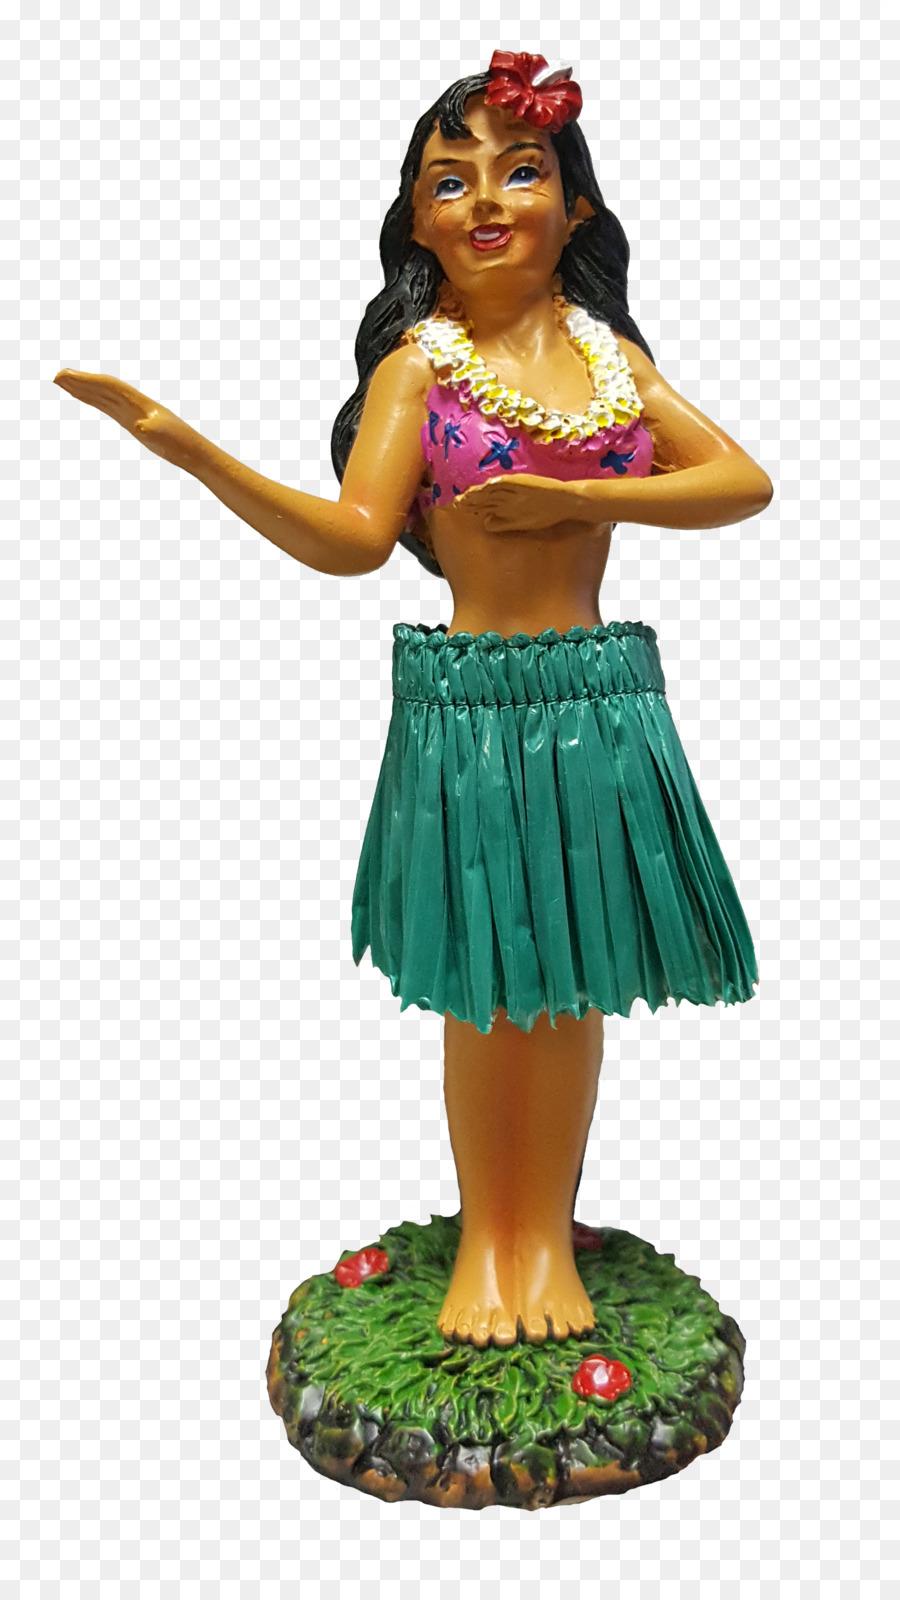 Hula Girl Png & Free Hula Girl.png Transparent Images #32754.